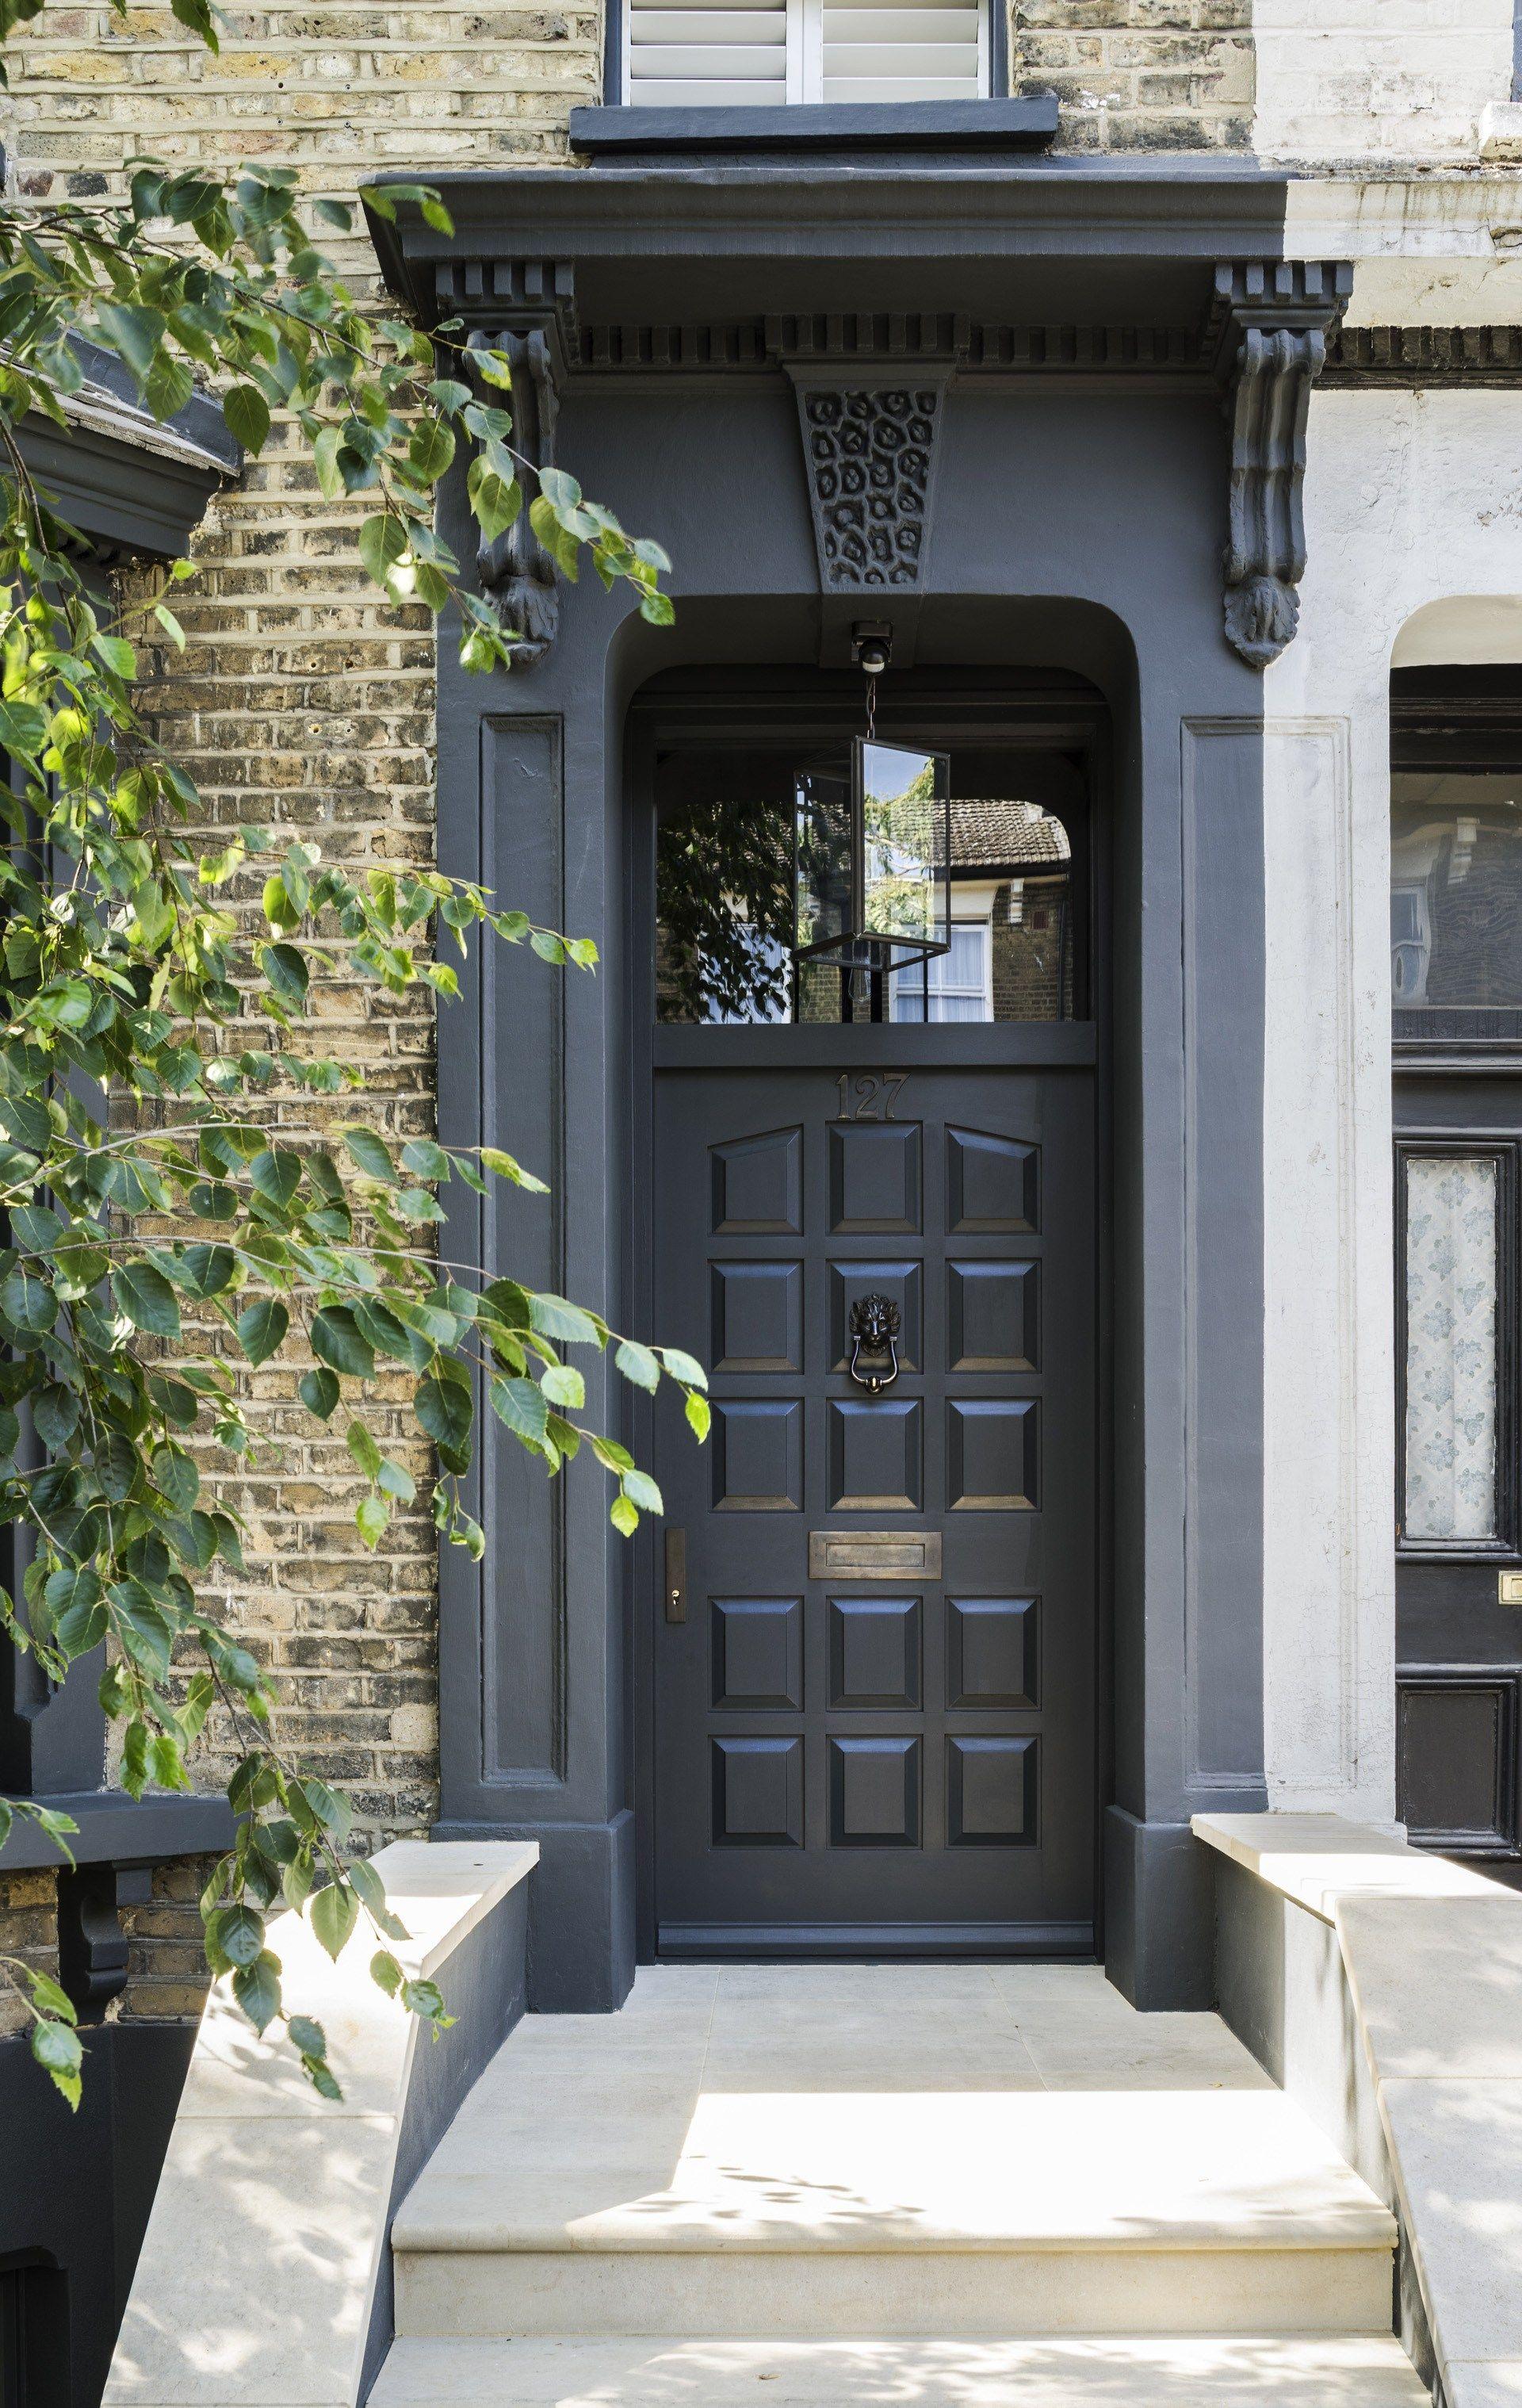 Pin by Natalie Lyon on doors   Pinterest   Doors